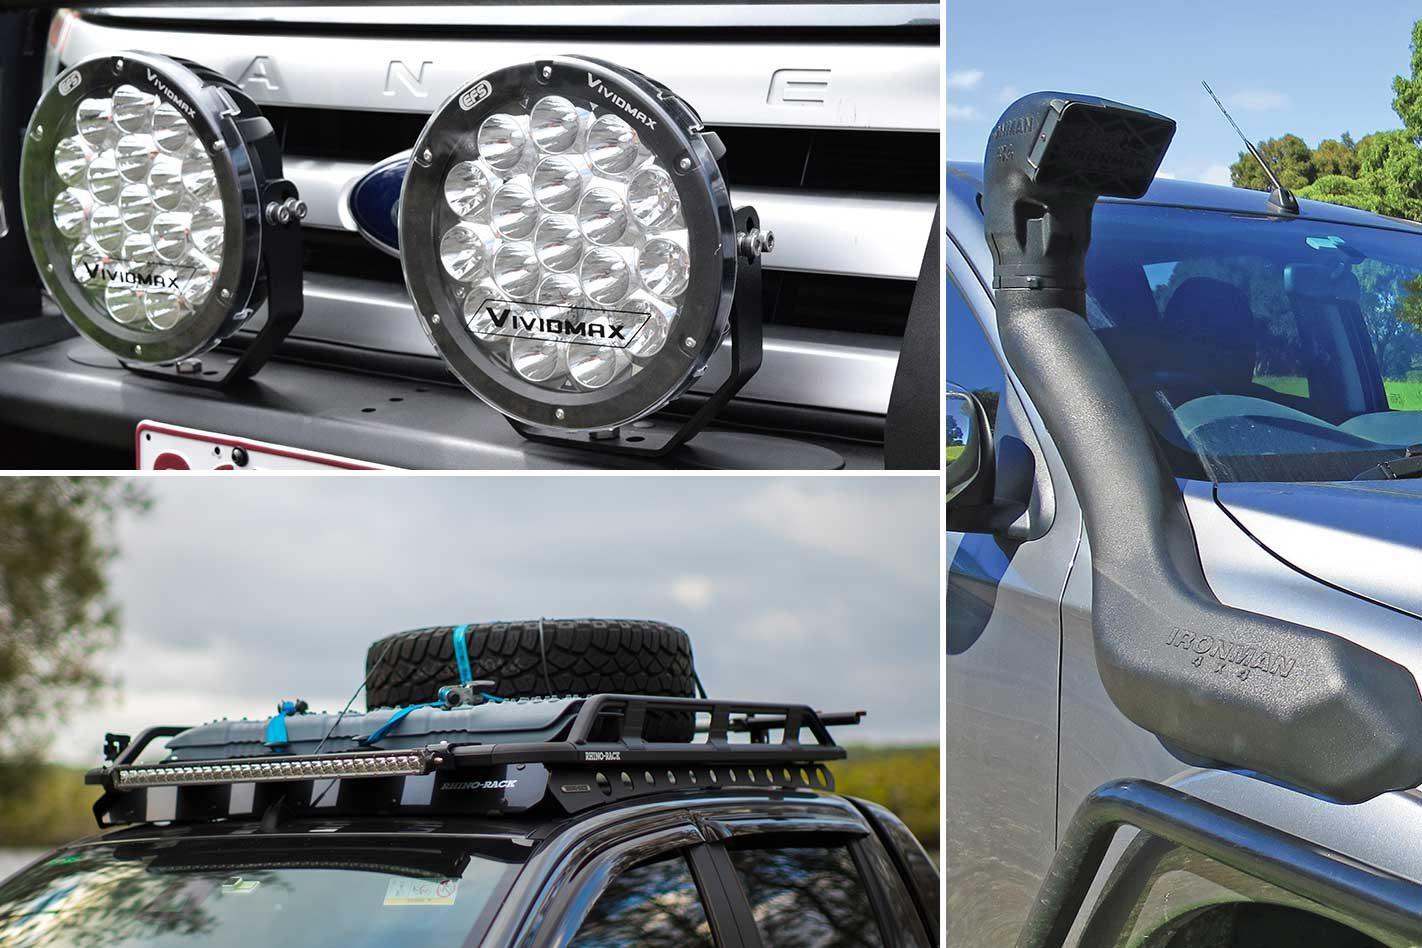 New 4x4 Gear: EFS LED driving lights, Rhino-Rack wind